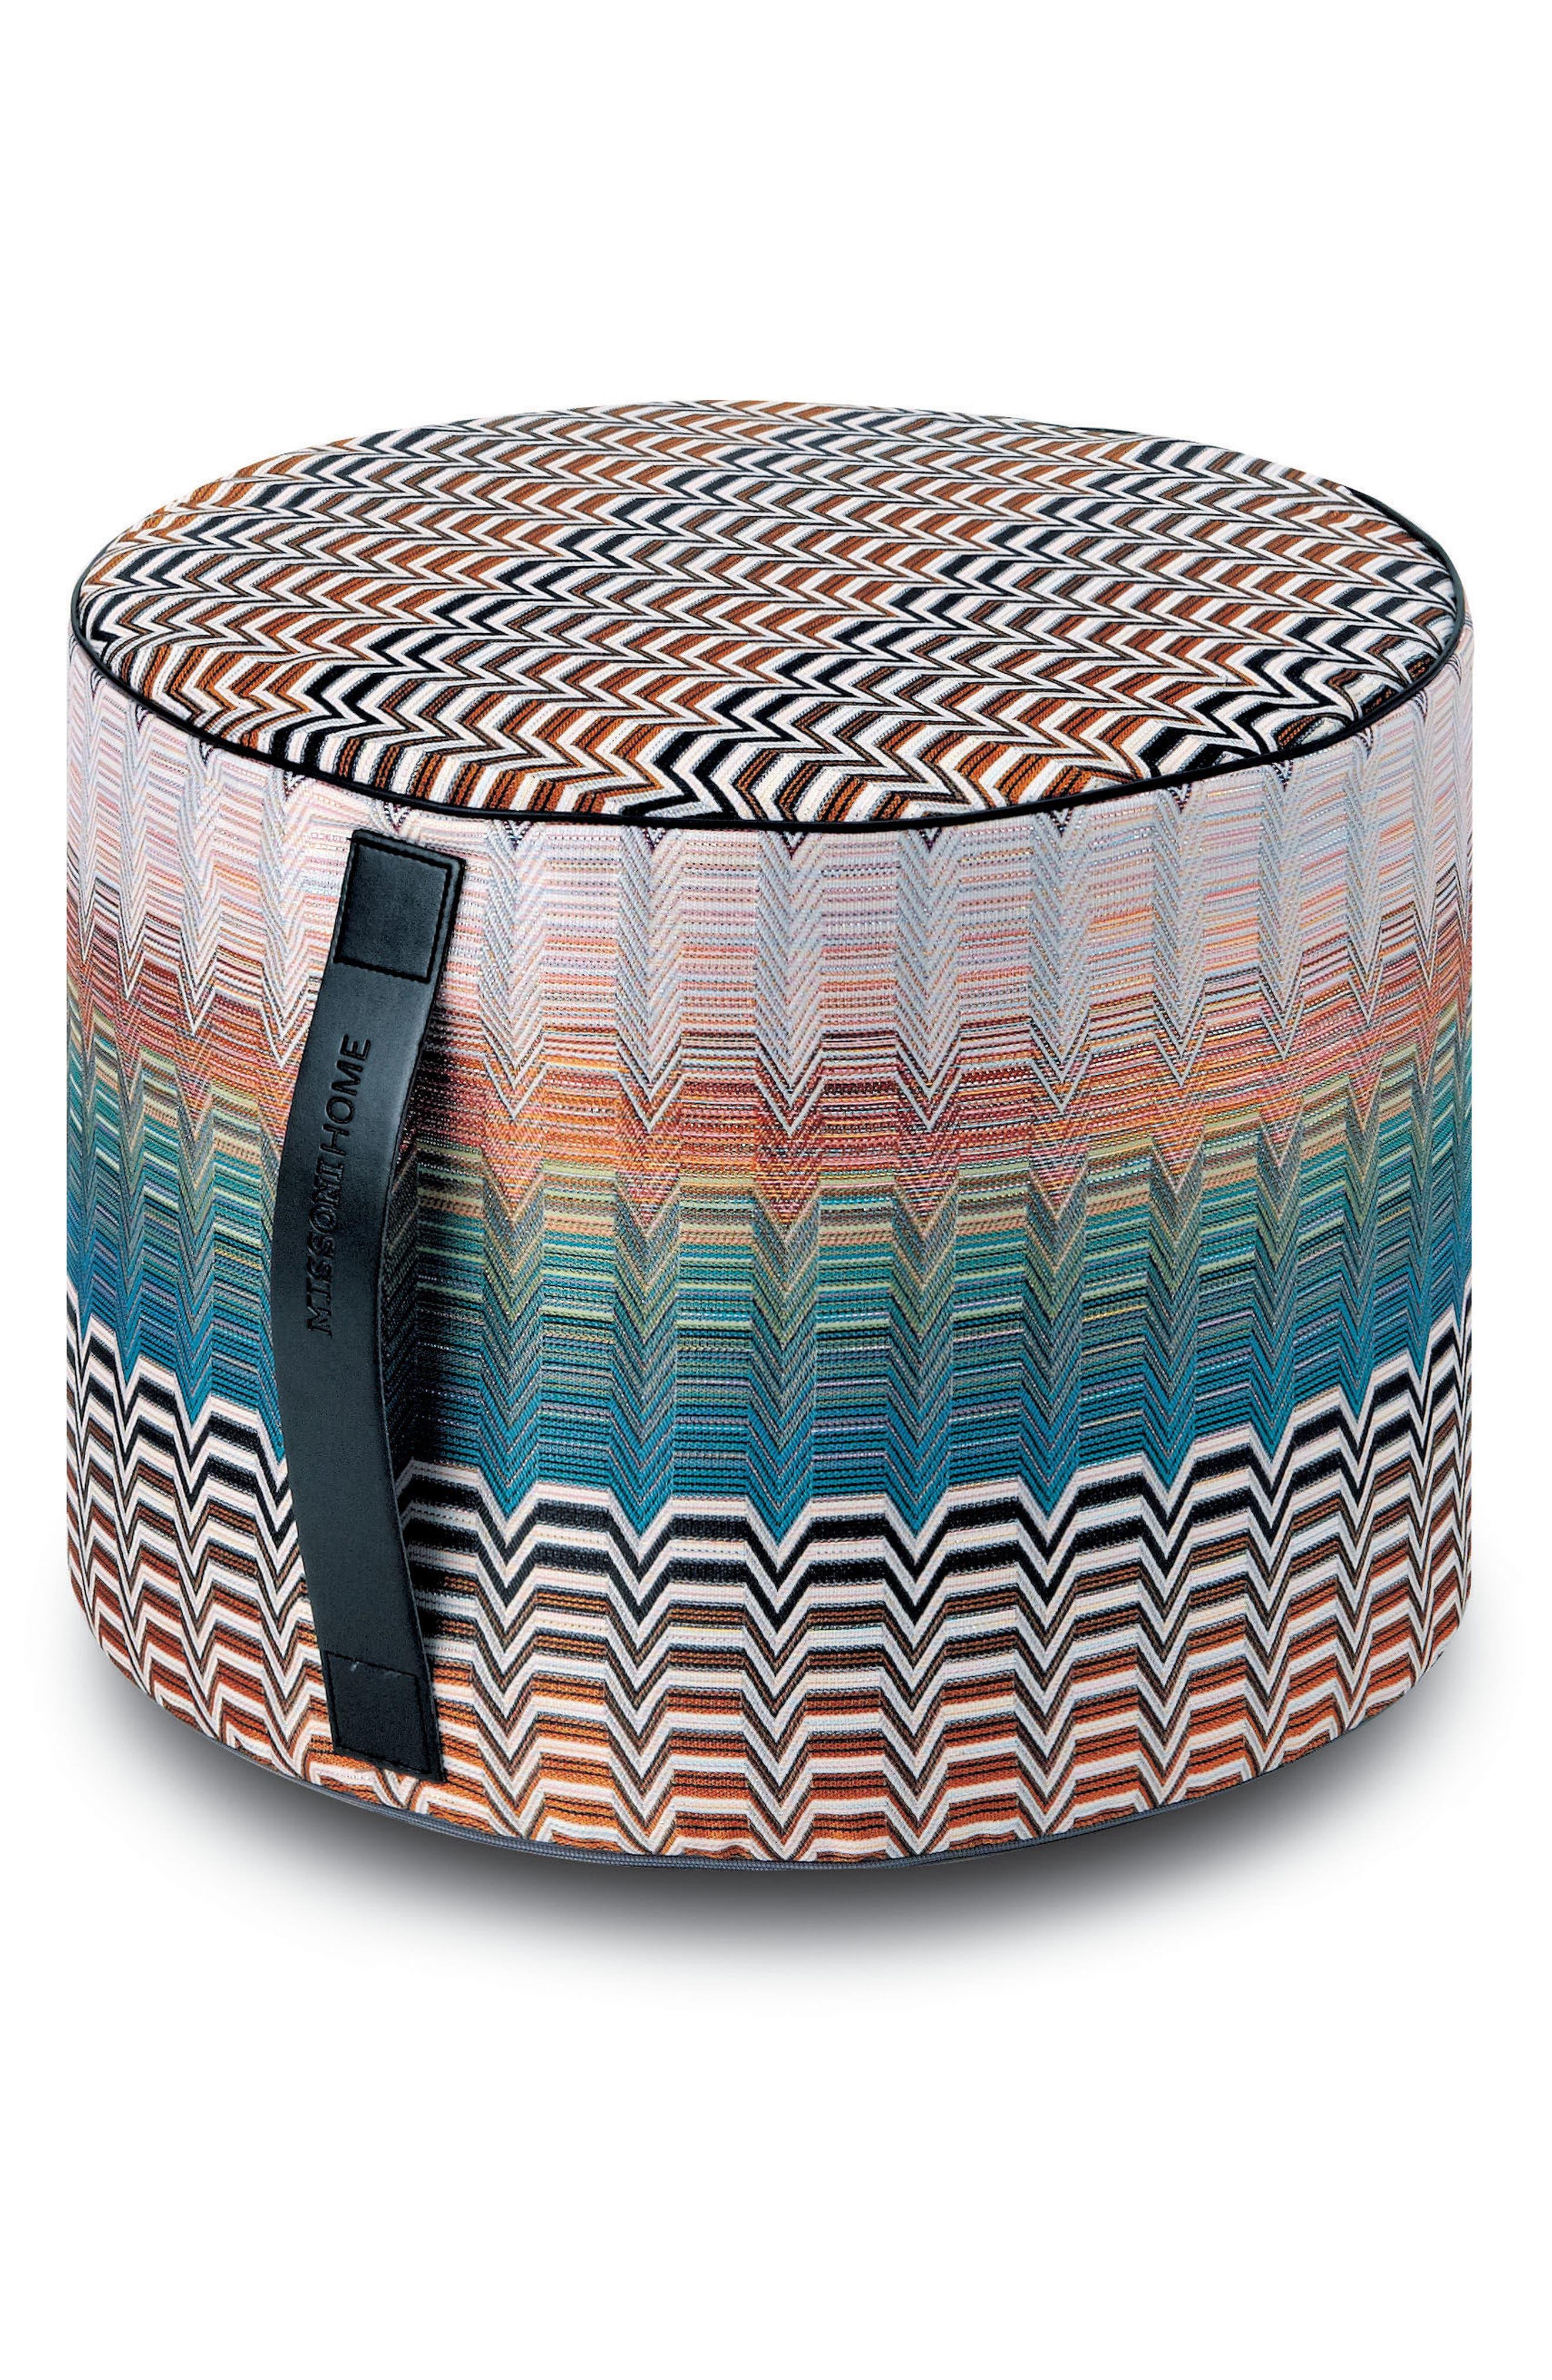 Santa Fe Seattle Cylindrical Floor Pouf,                         Main,                         color, 440